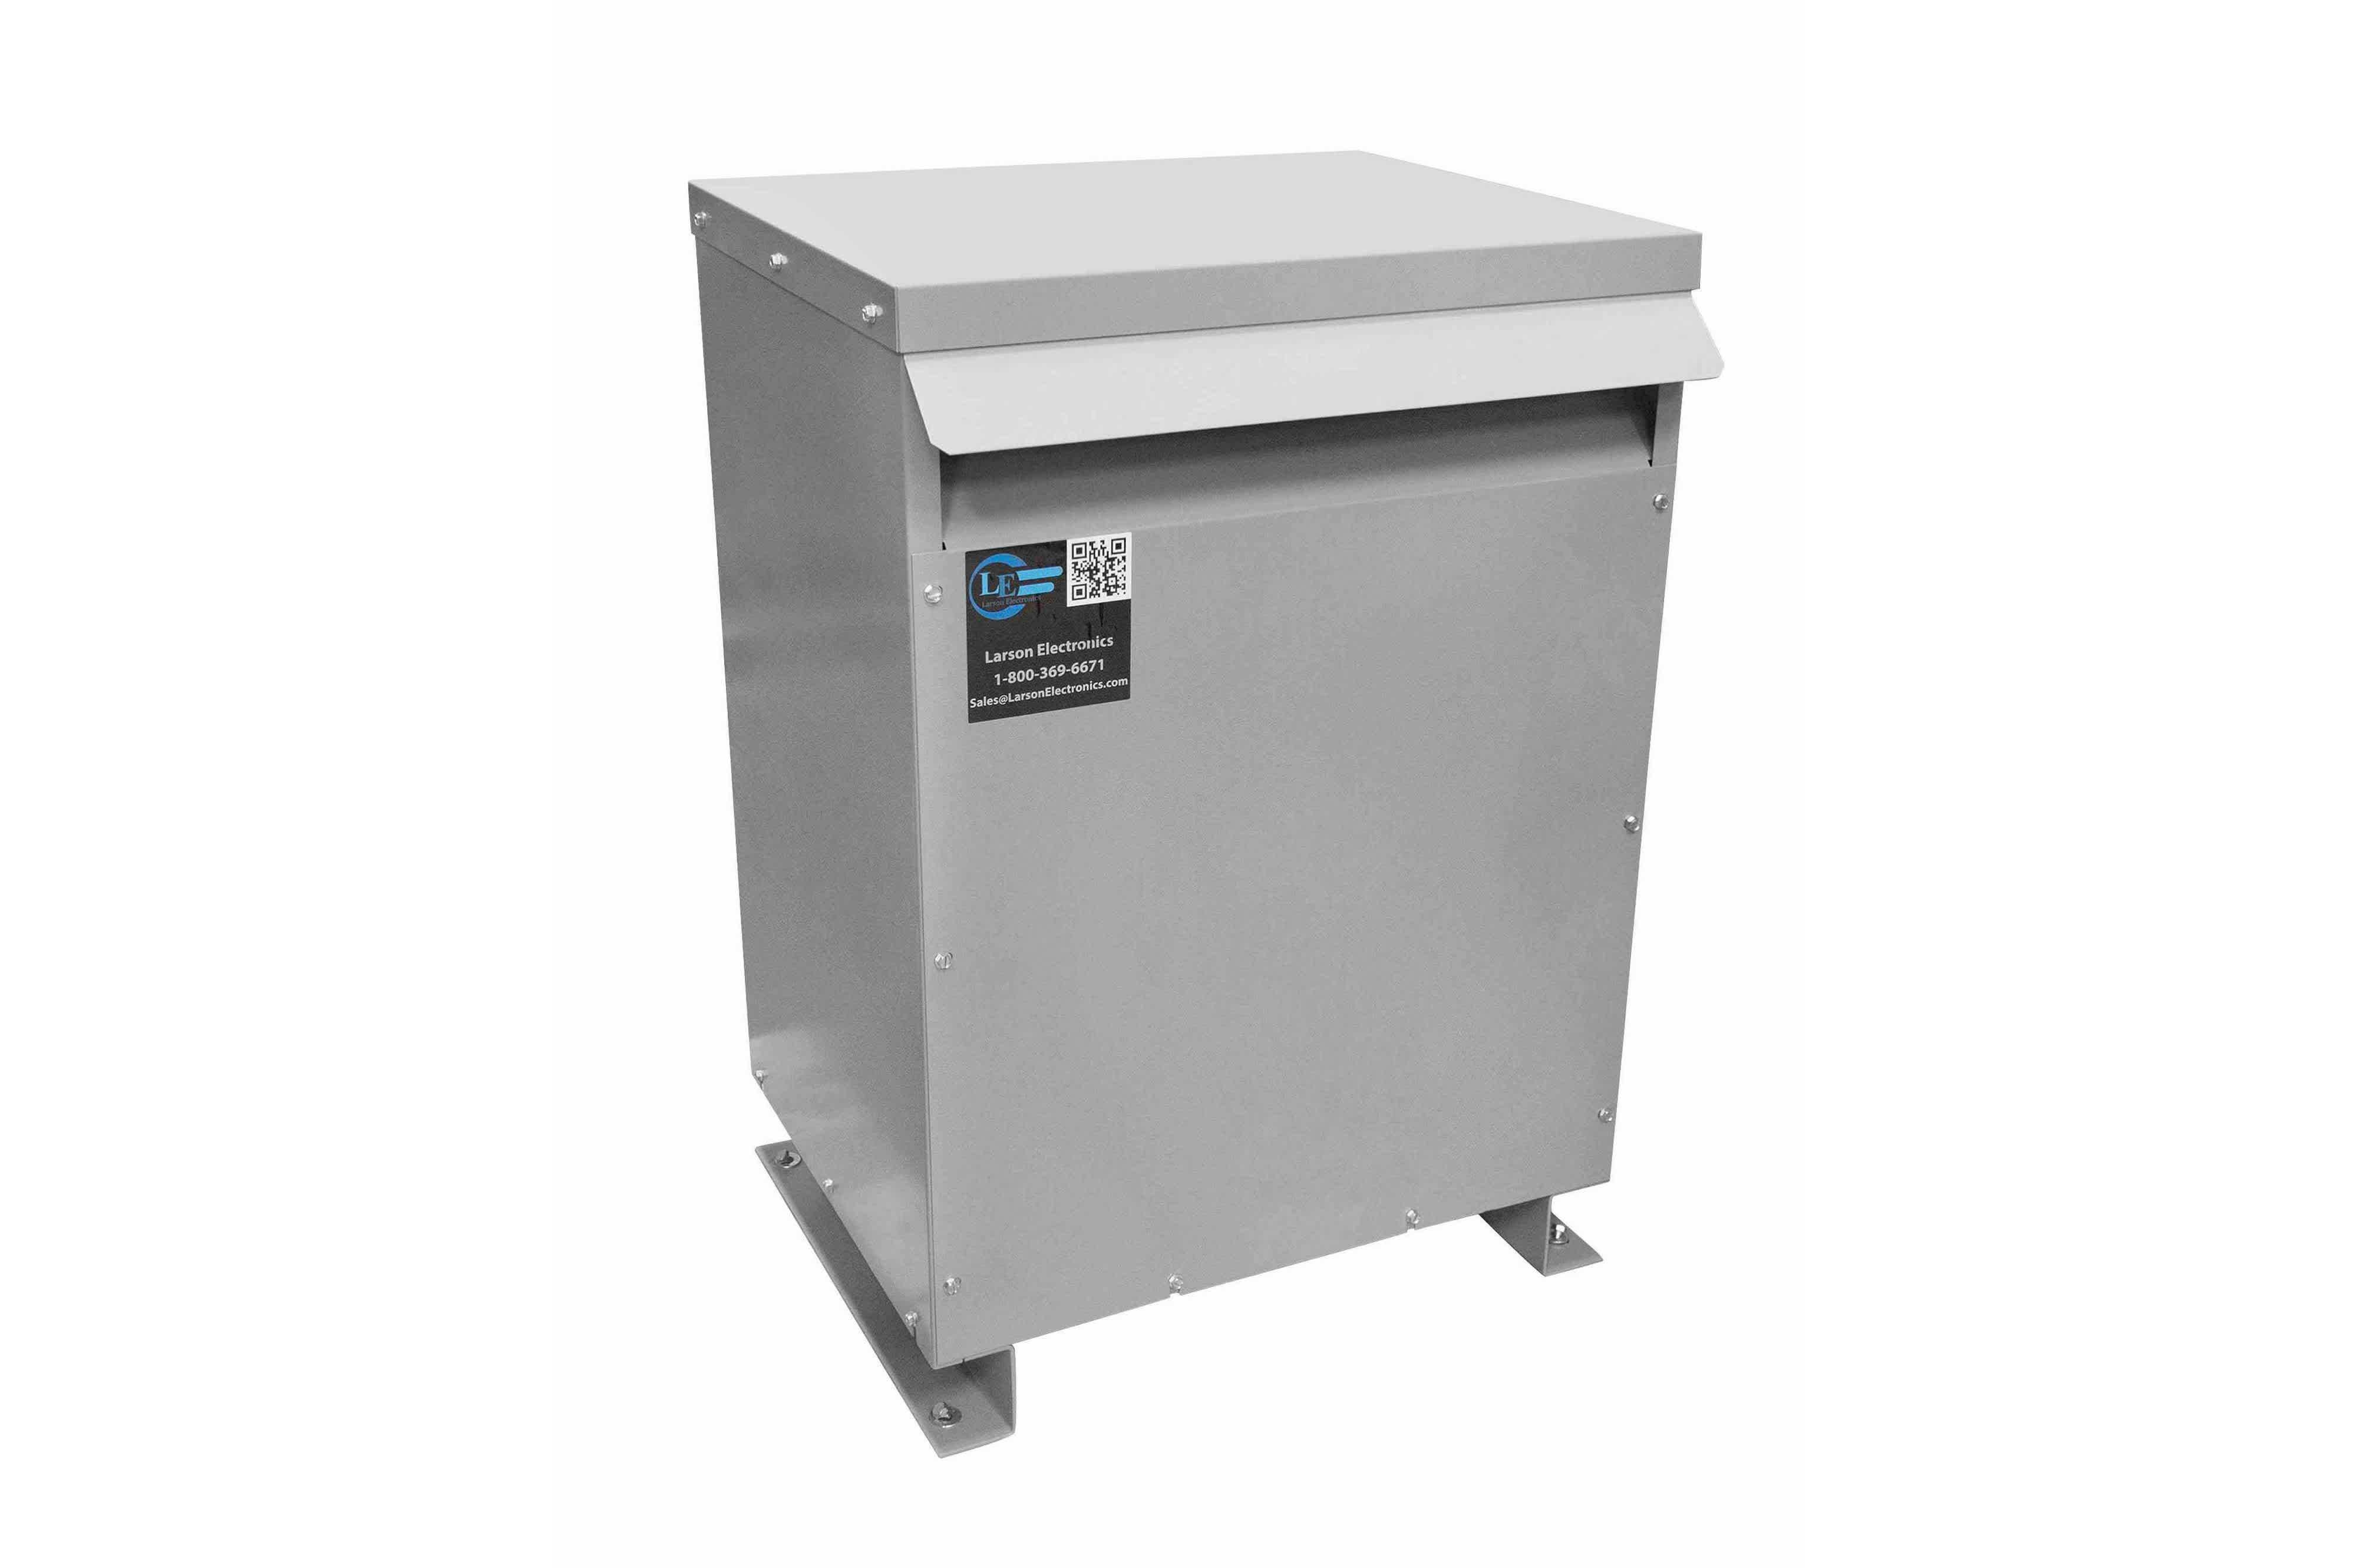 29 kVA 3PH Isolation Transformer, 208V Wye Primary, 208V Delta Secondary, N3R, Ventilated, 60 Hz